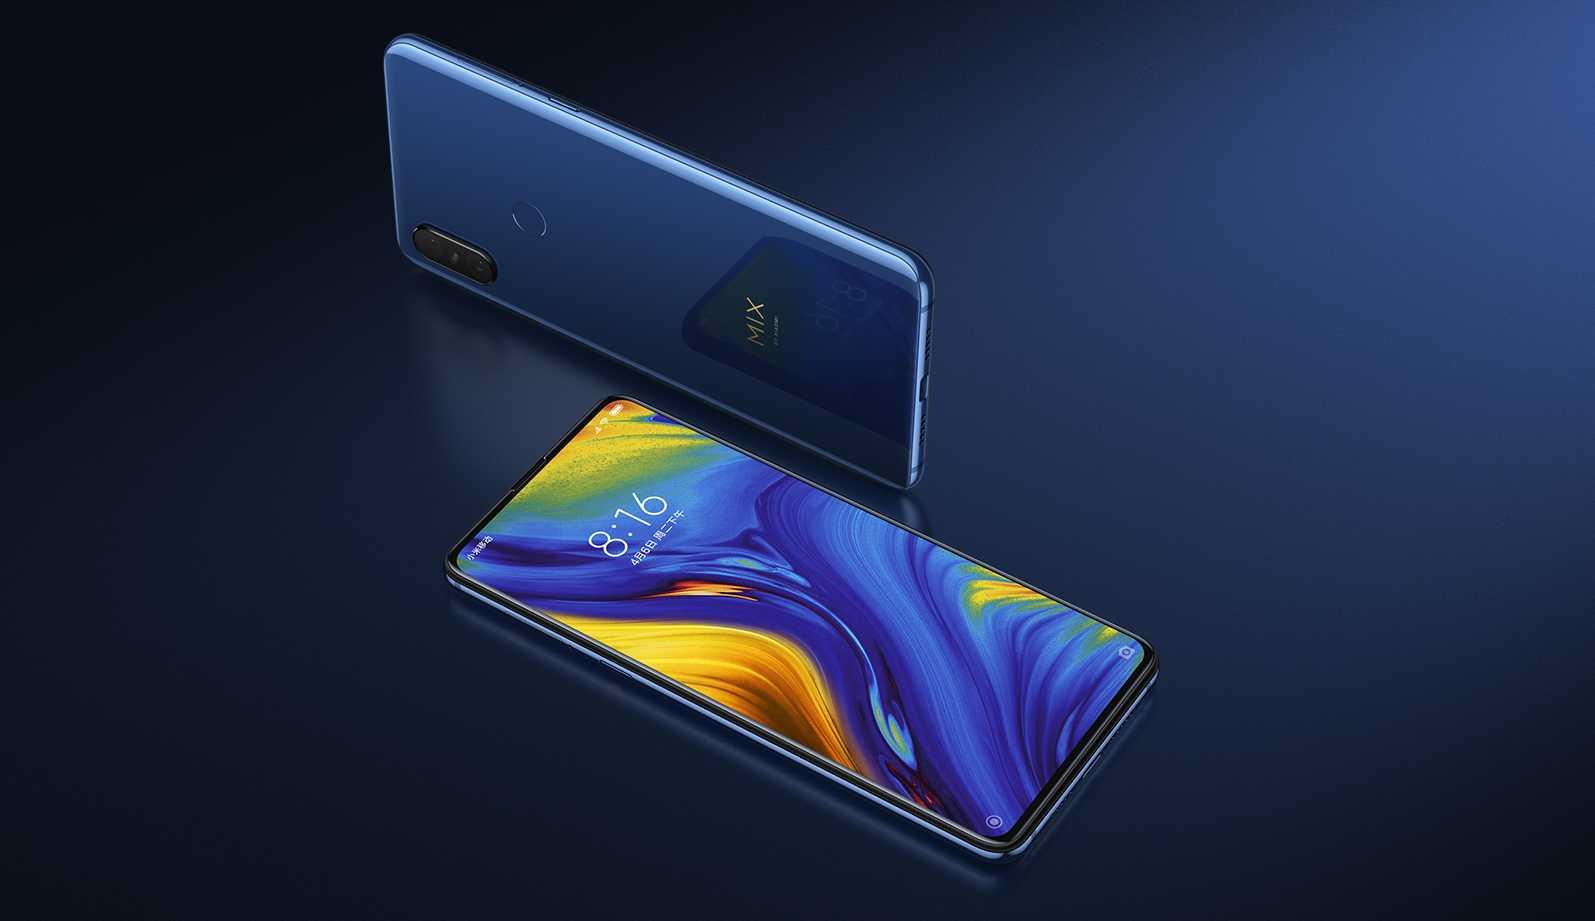 Xiaomi Mi Mix 3 smartphone